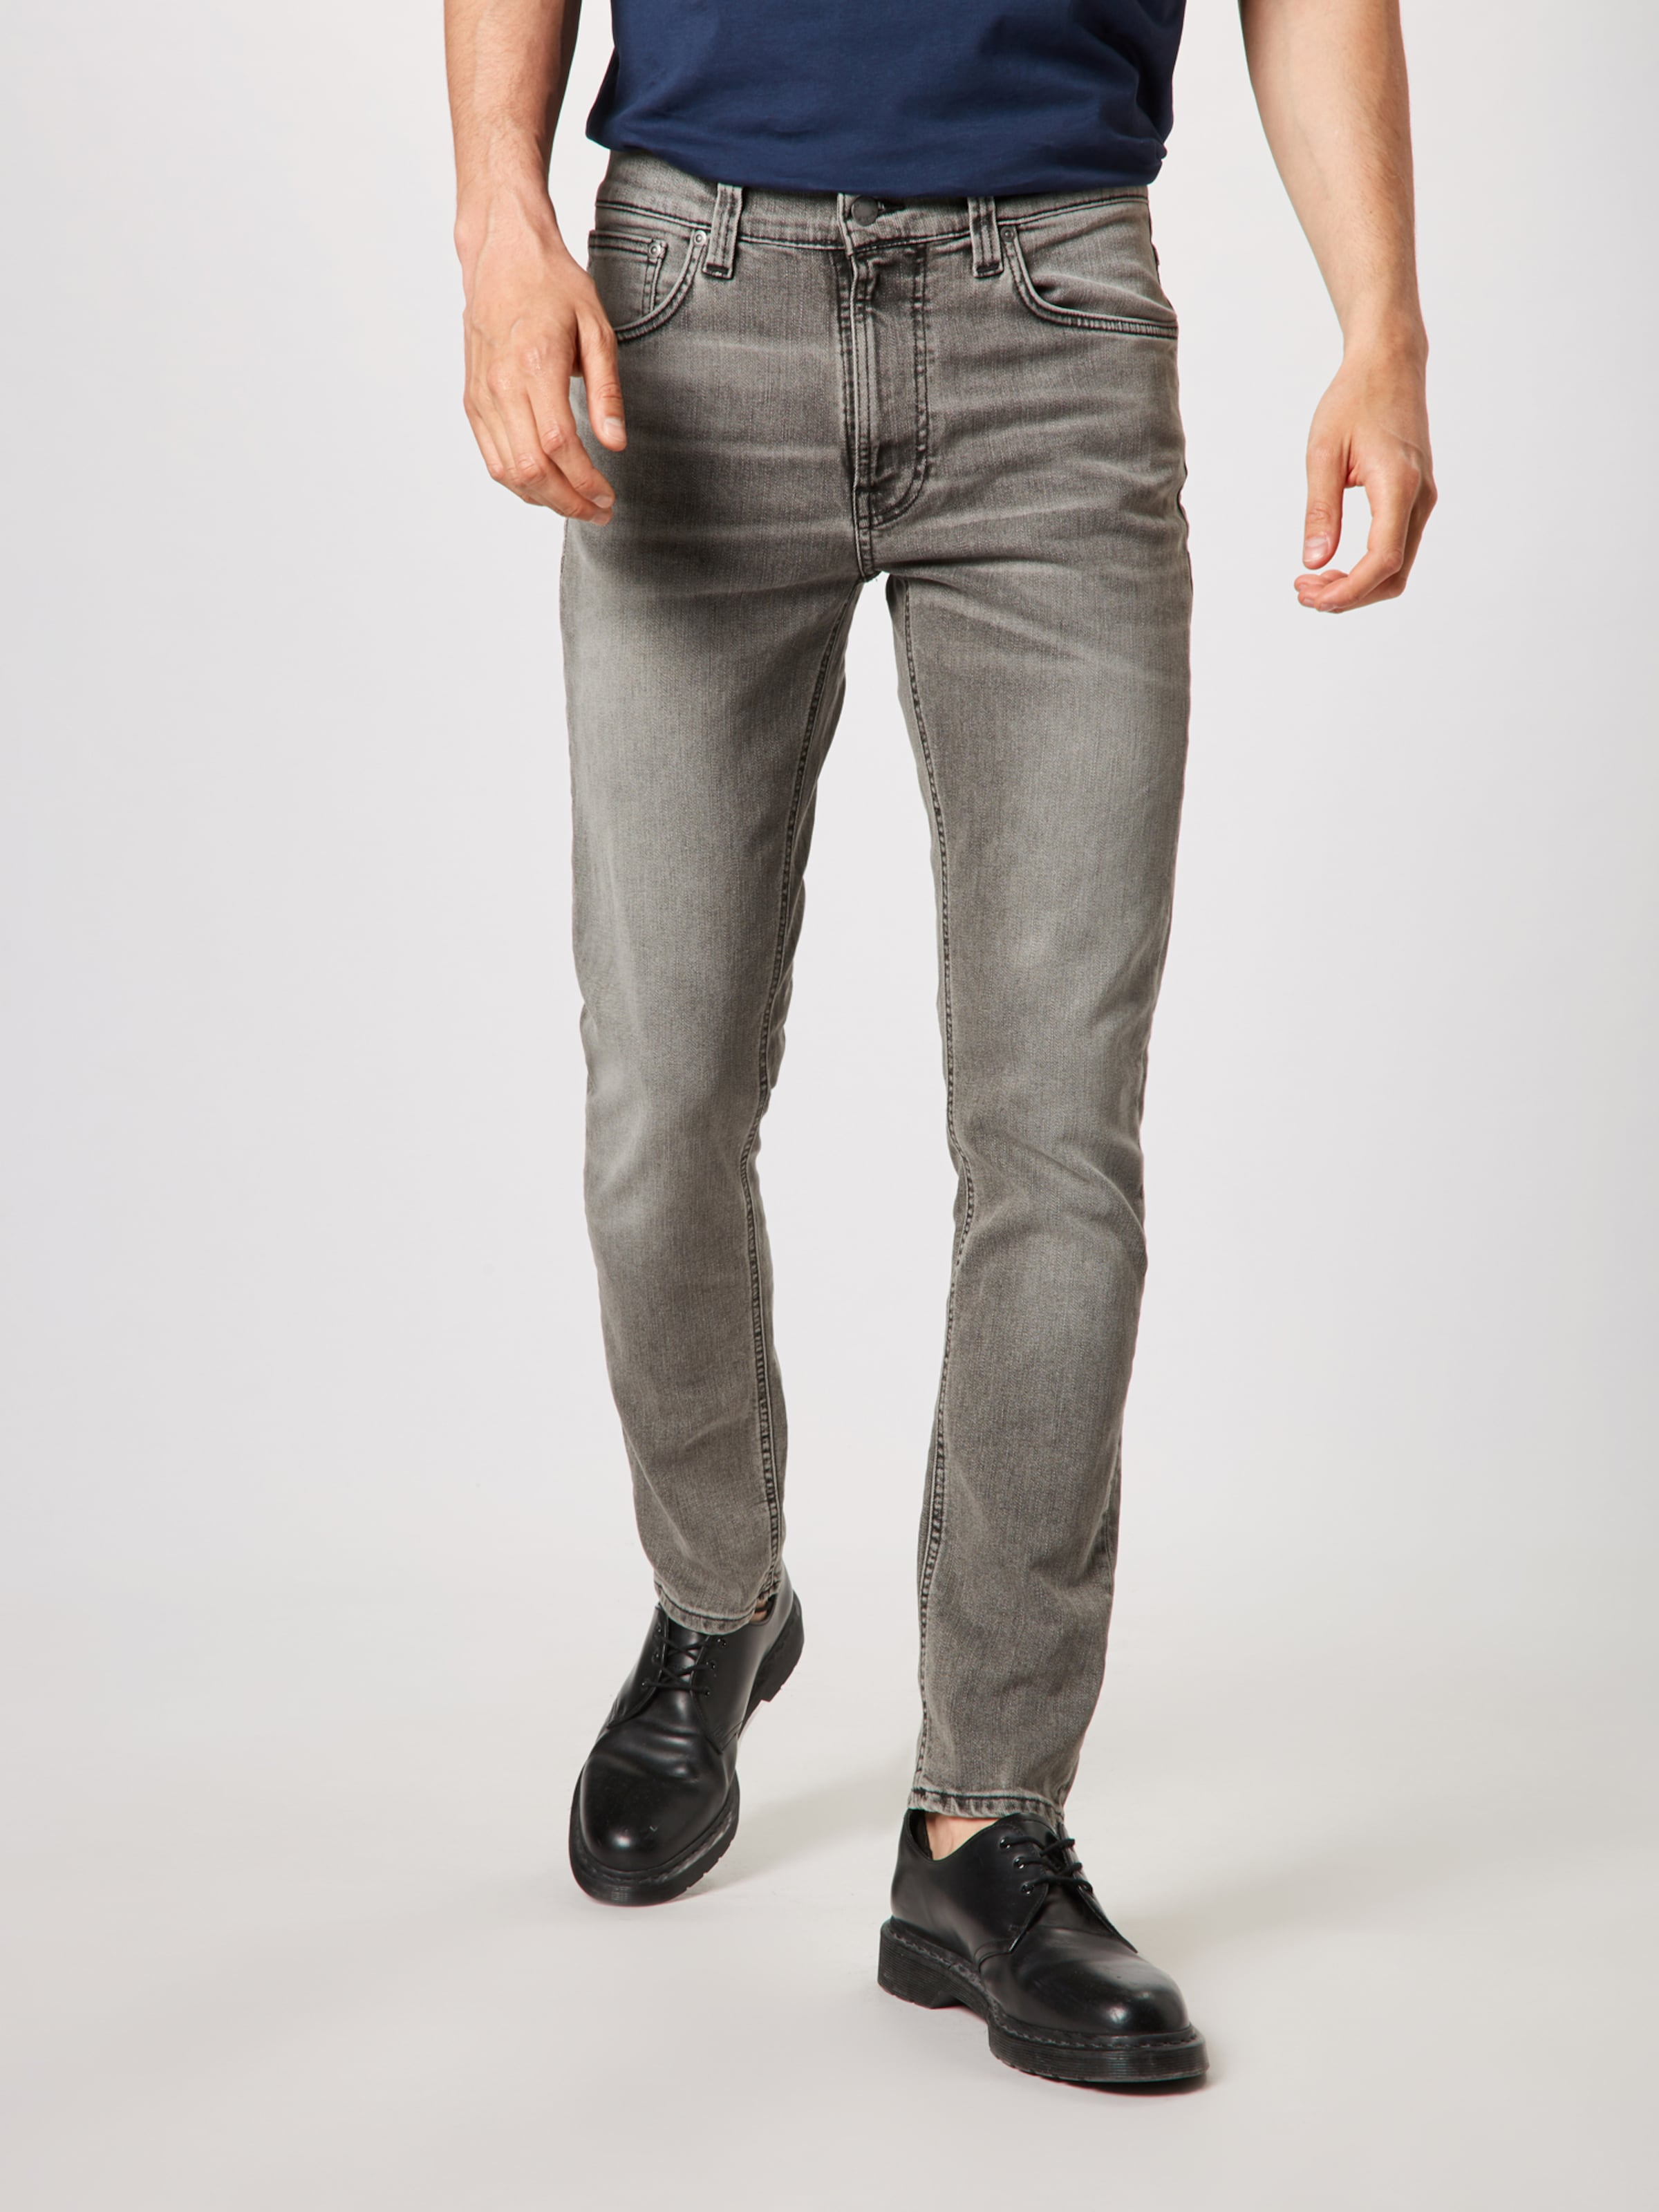 Dean' In Denim Jeans 'lean Co Grey Nudie tsChxQrd